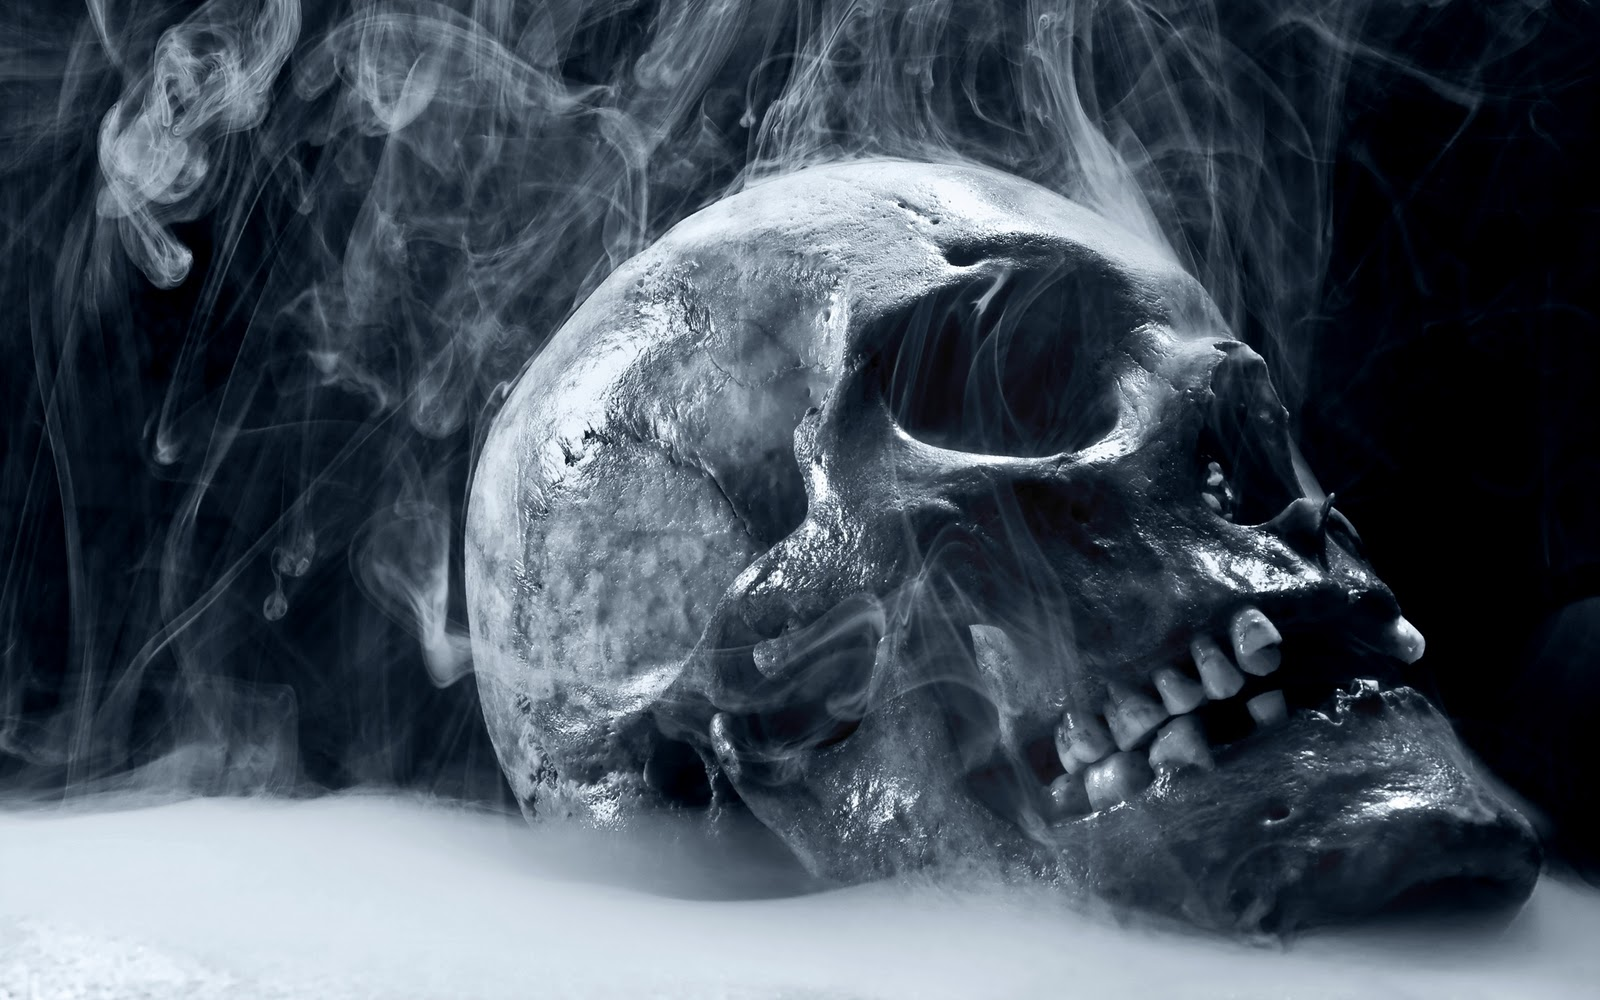 trololo blogg: Skull Wallpaper Download